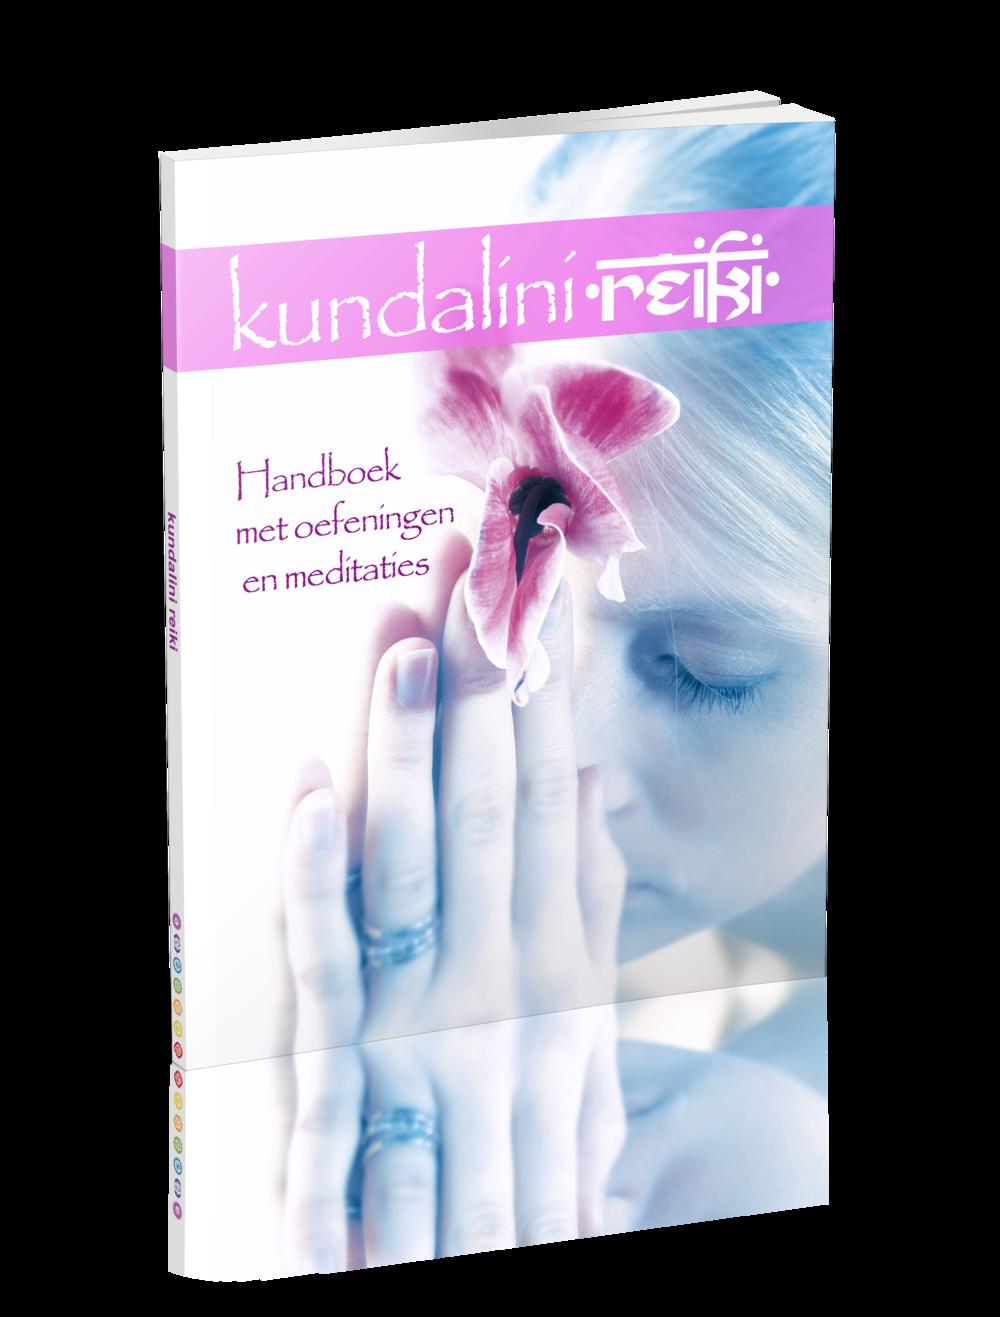 Kundalini Reiki 1 2 en 3